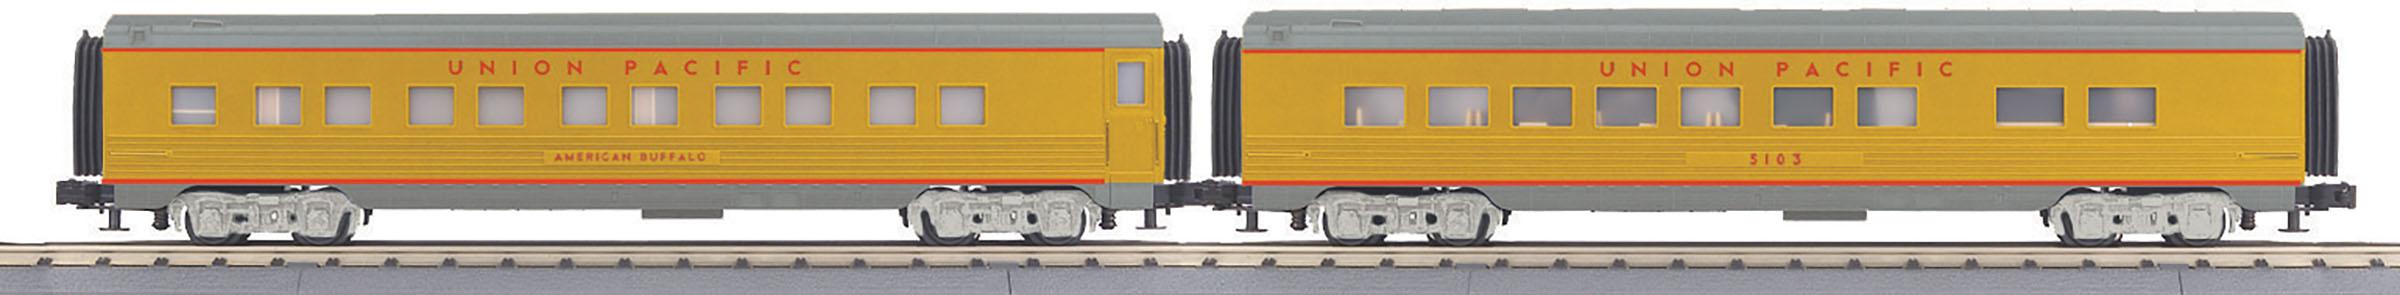 MTH 30-68141 60' Streamlined Sleeper Diner Set 3 Rail RailKing Union Pacific